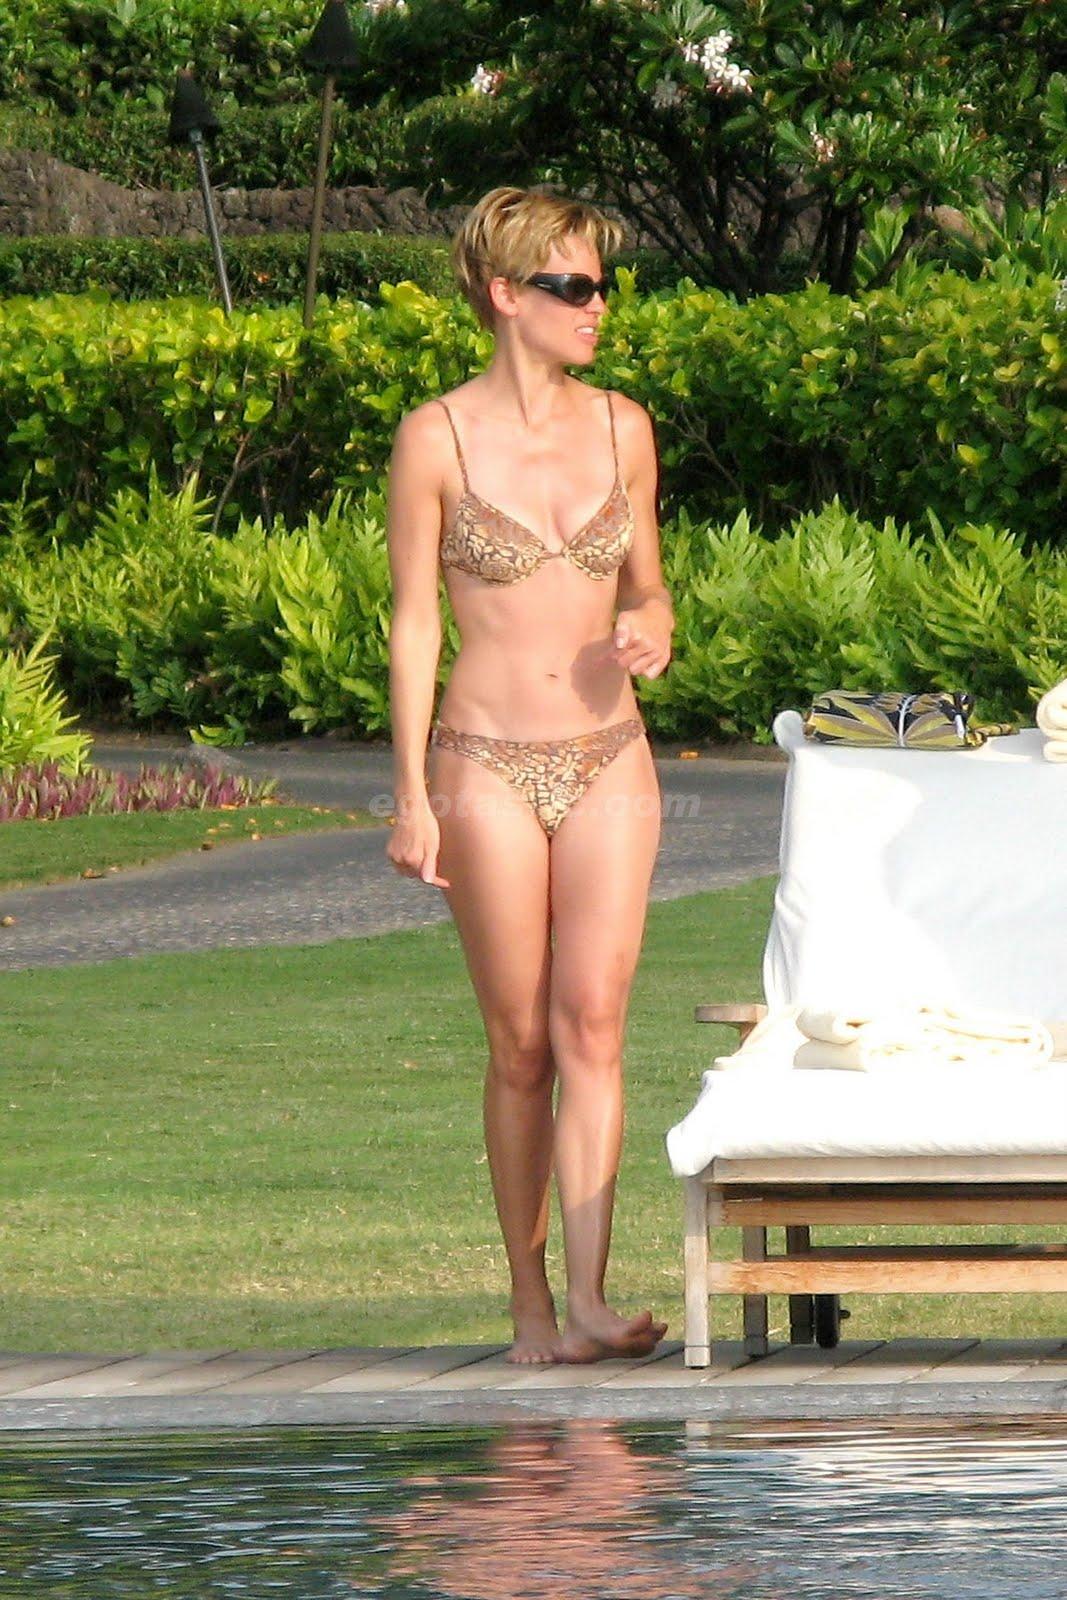 http://4.bp.blogspot.com/_3G4dg-GWVKI/TJNNSd8duSI/AAAAAAAAIAA/Y_kgubTj_7o/s1600/12635_hilary-swank-bikini-1-20_123_658lo.jpg